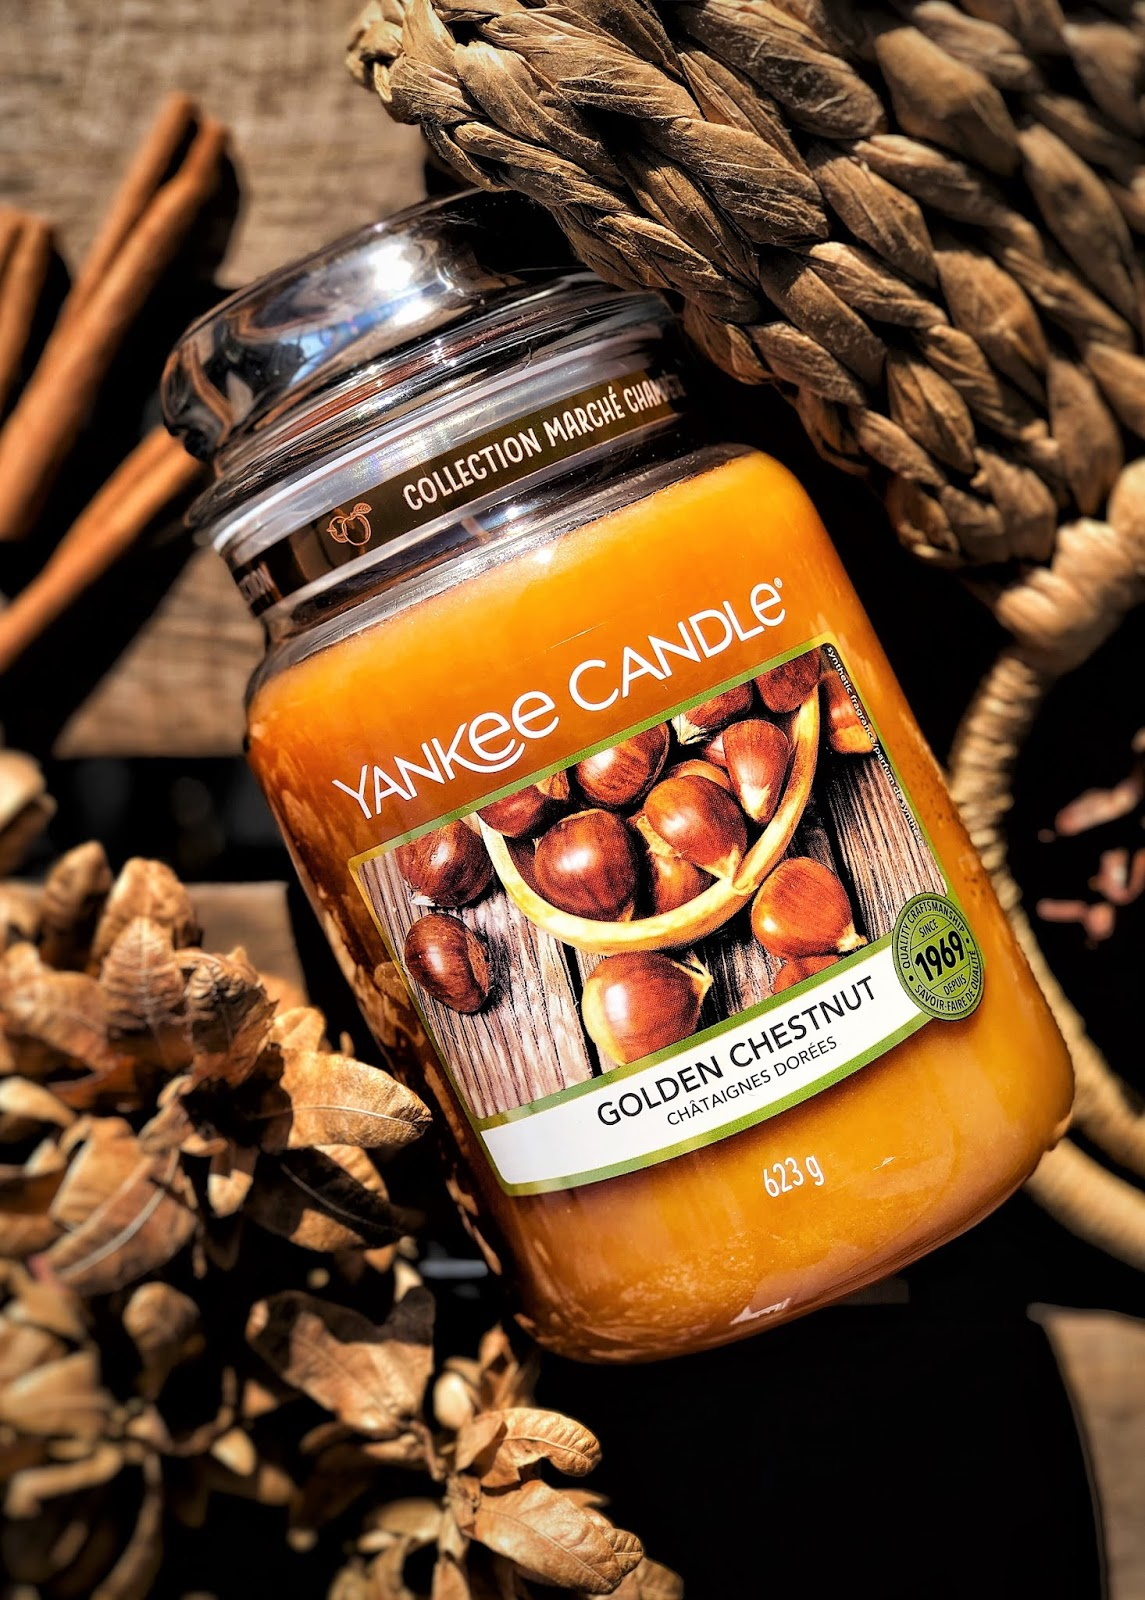 Golden-Chestnut-Yankee-Candle